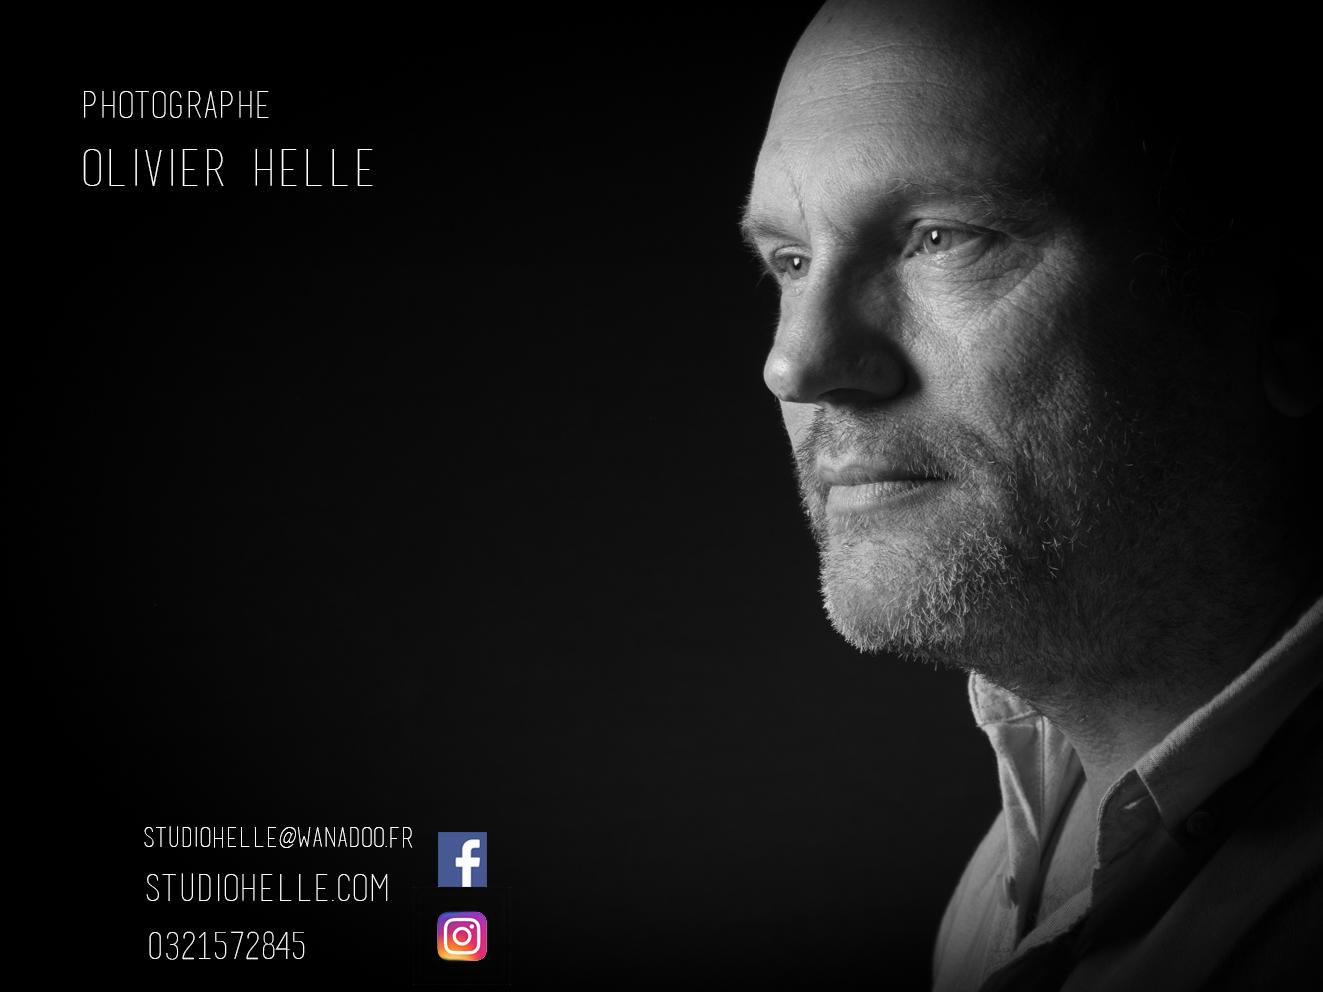 https://www.studiohelle.com/wp-content/uploads/2018/09/A6660881.jpg